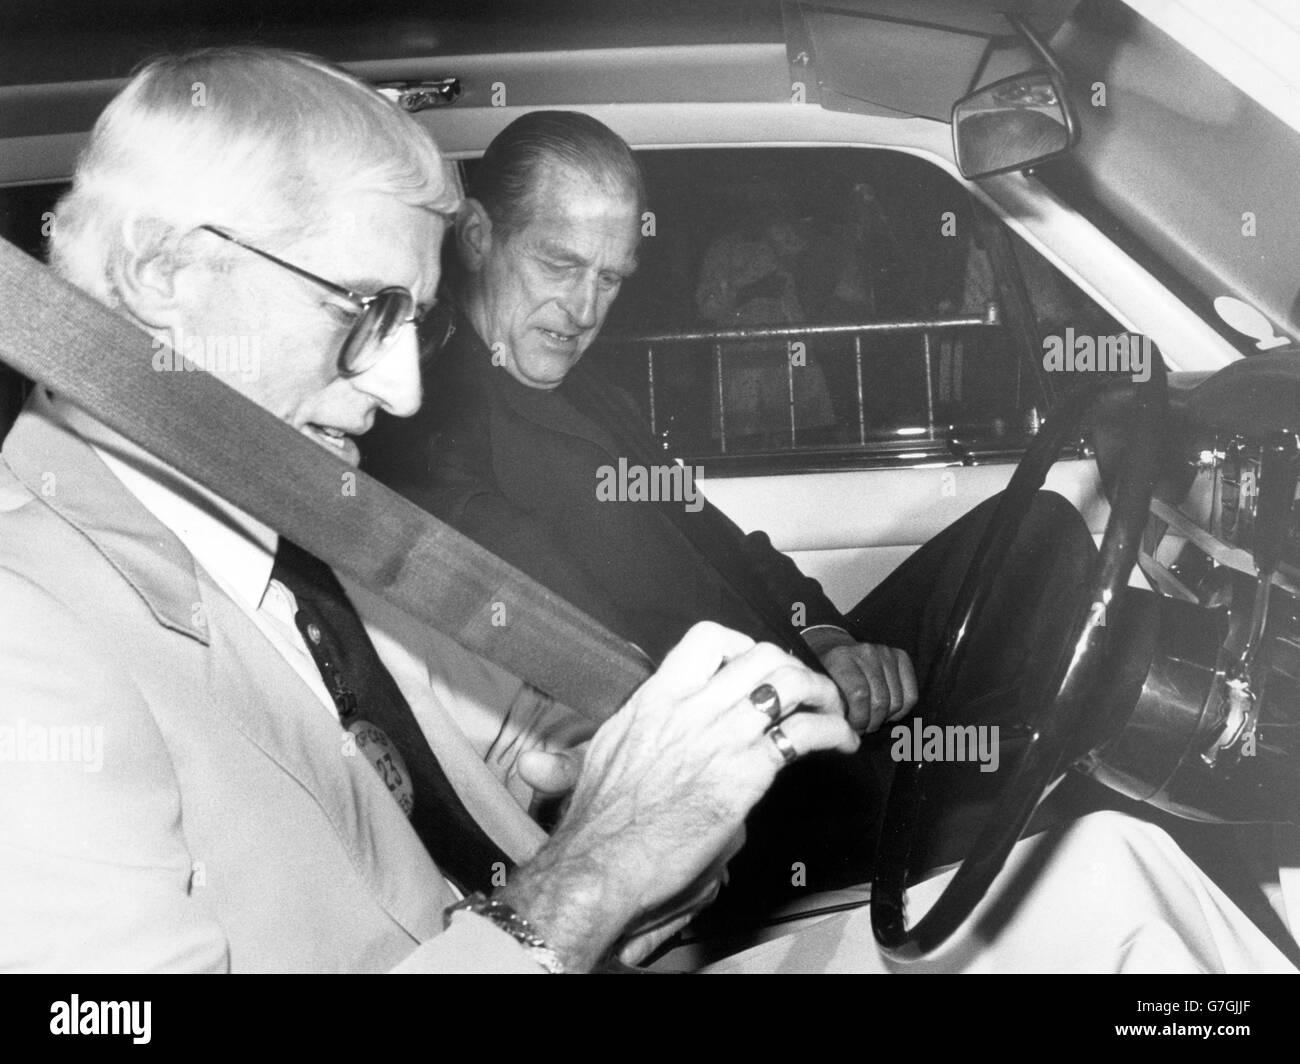 Royalty - Duke of Edinburgh and Jimmy Savile - Stoke Mandeville Hospital Stock Photo